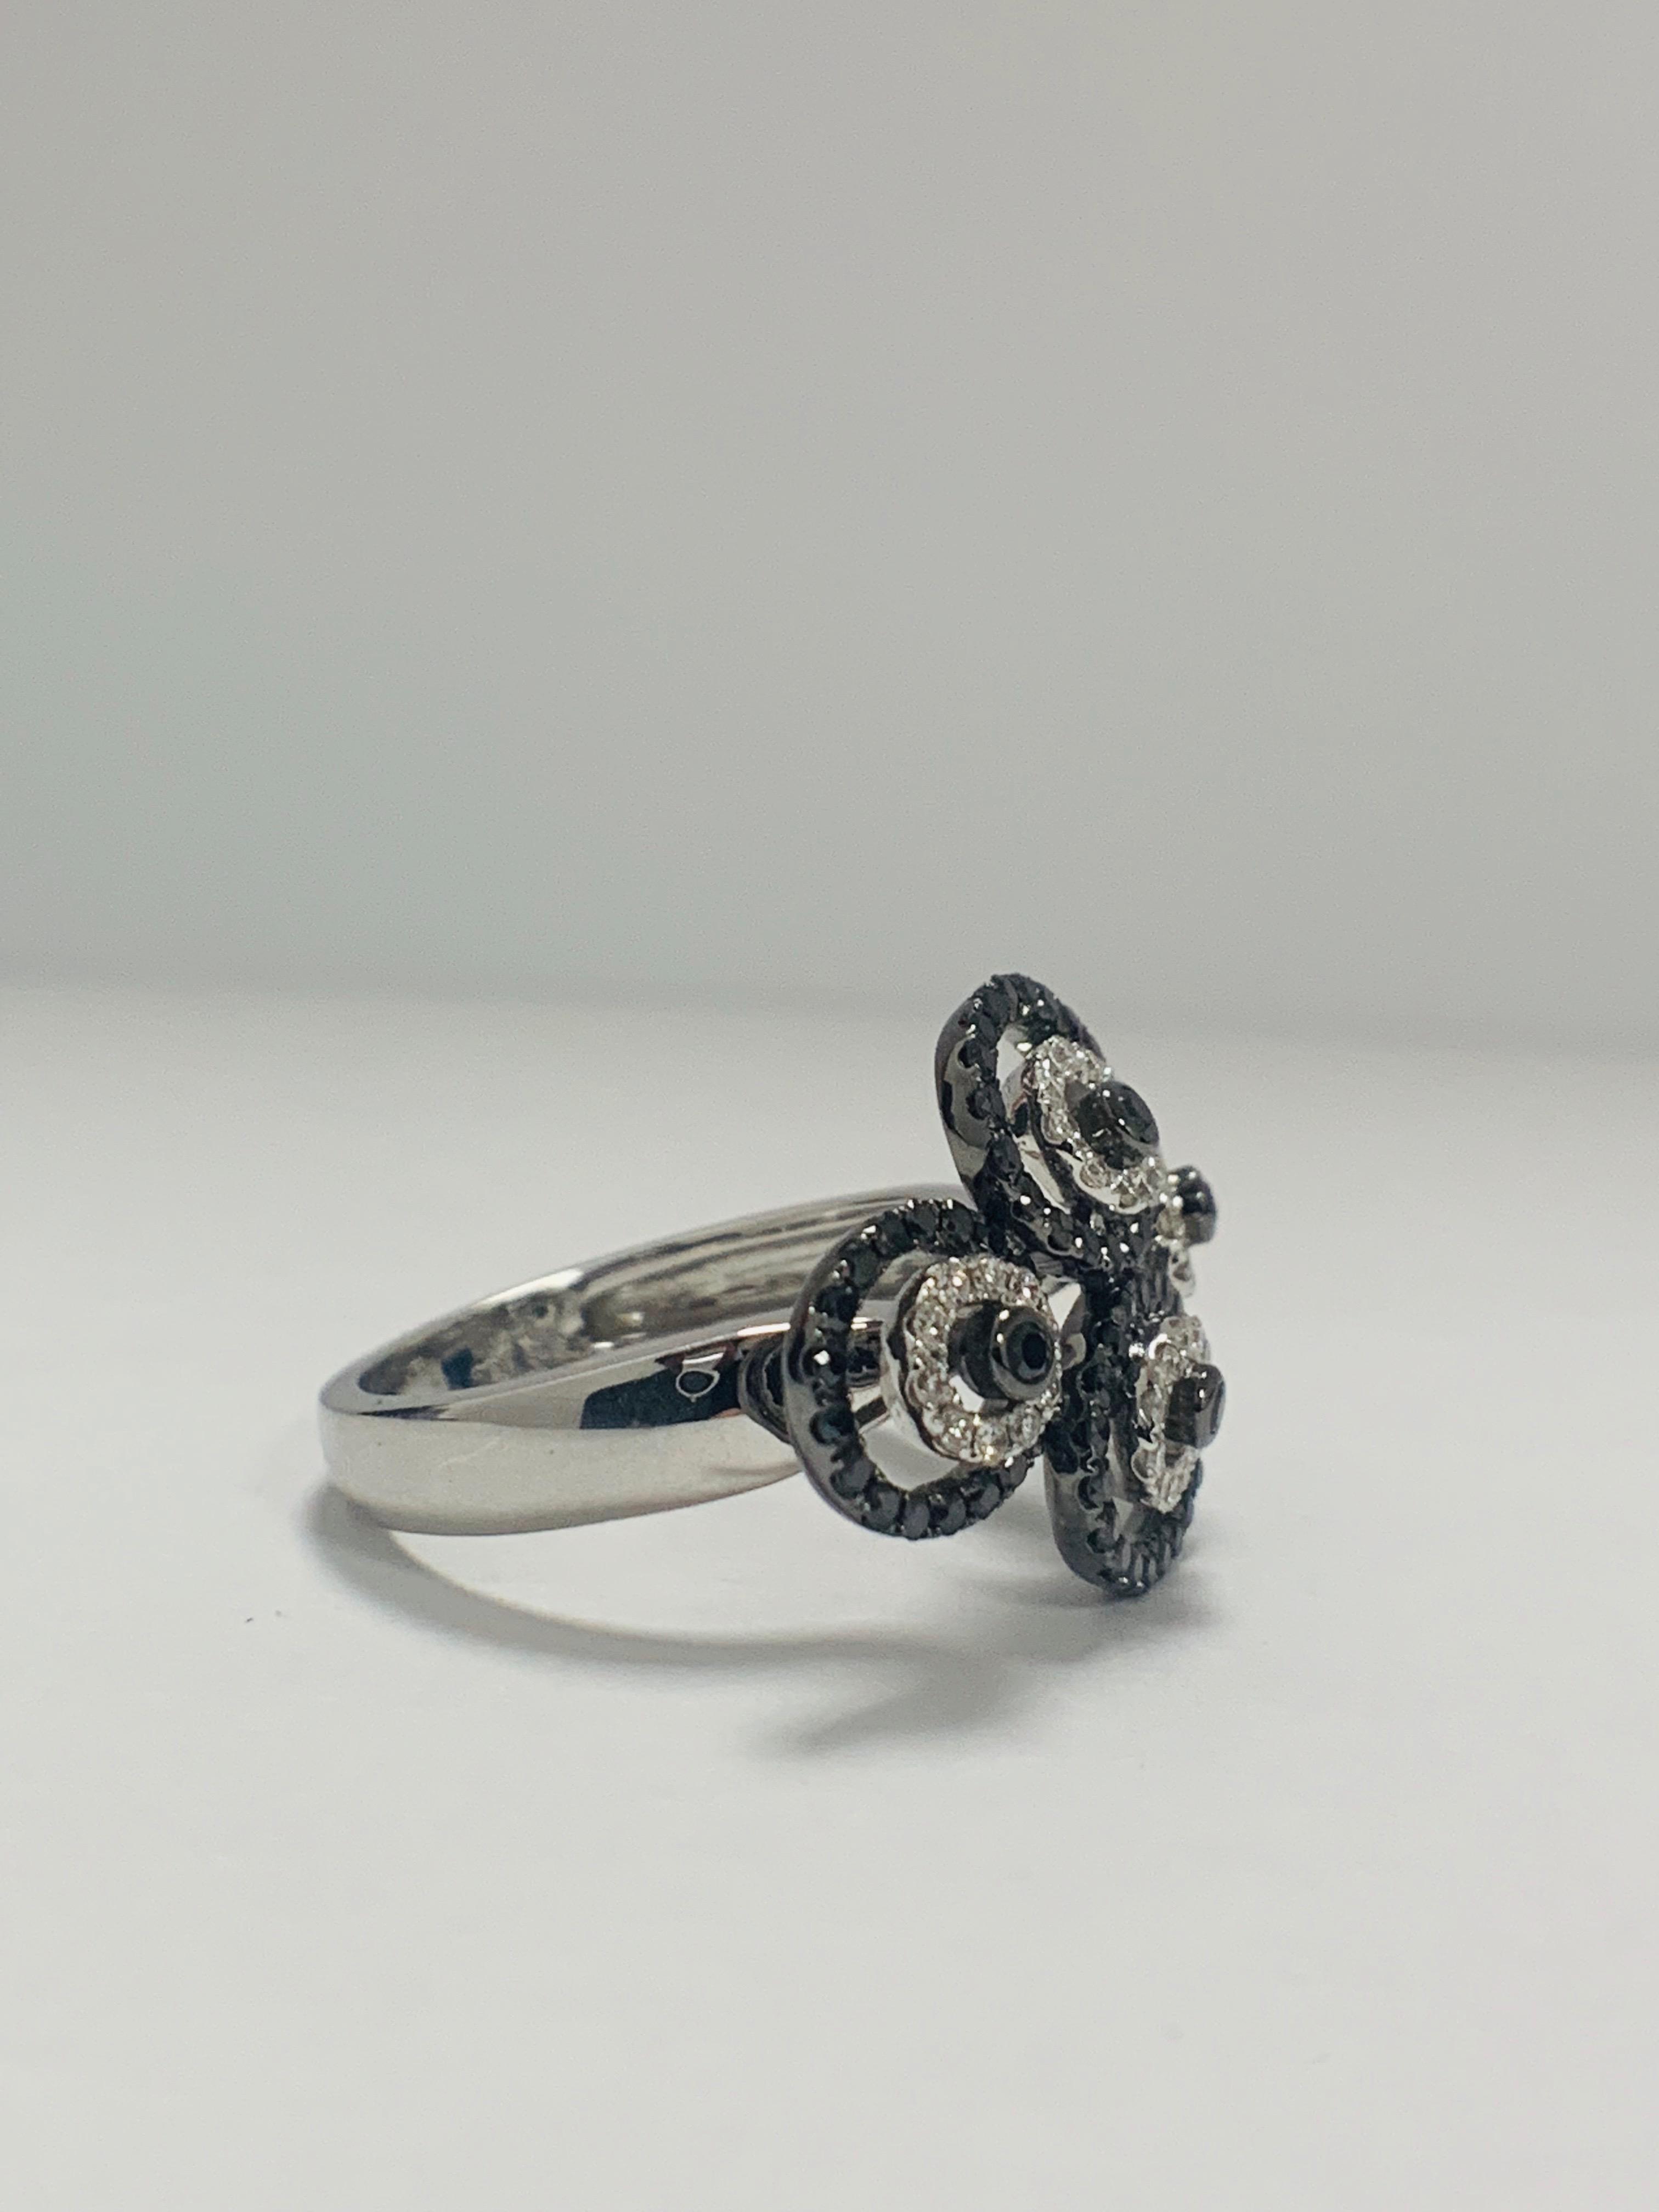 18ct White Gold Diamond ring featuring 80 round cut, black Diamonds (0.61ct TBDW) - Image 7 of 12